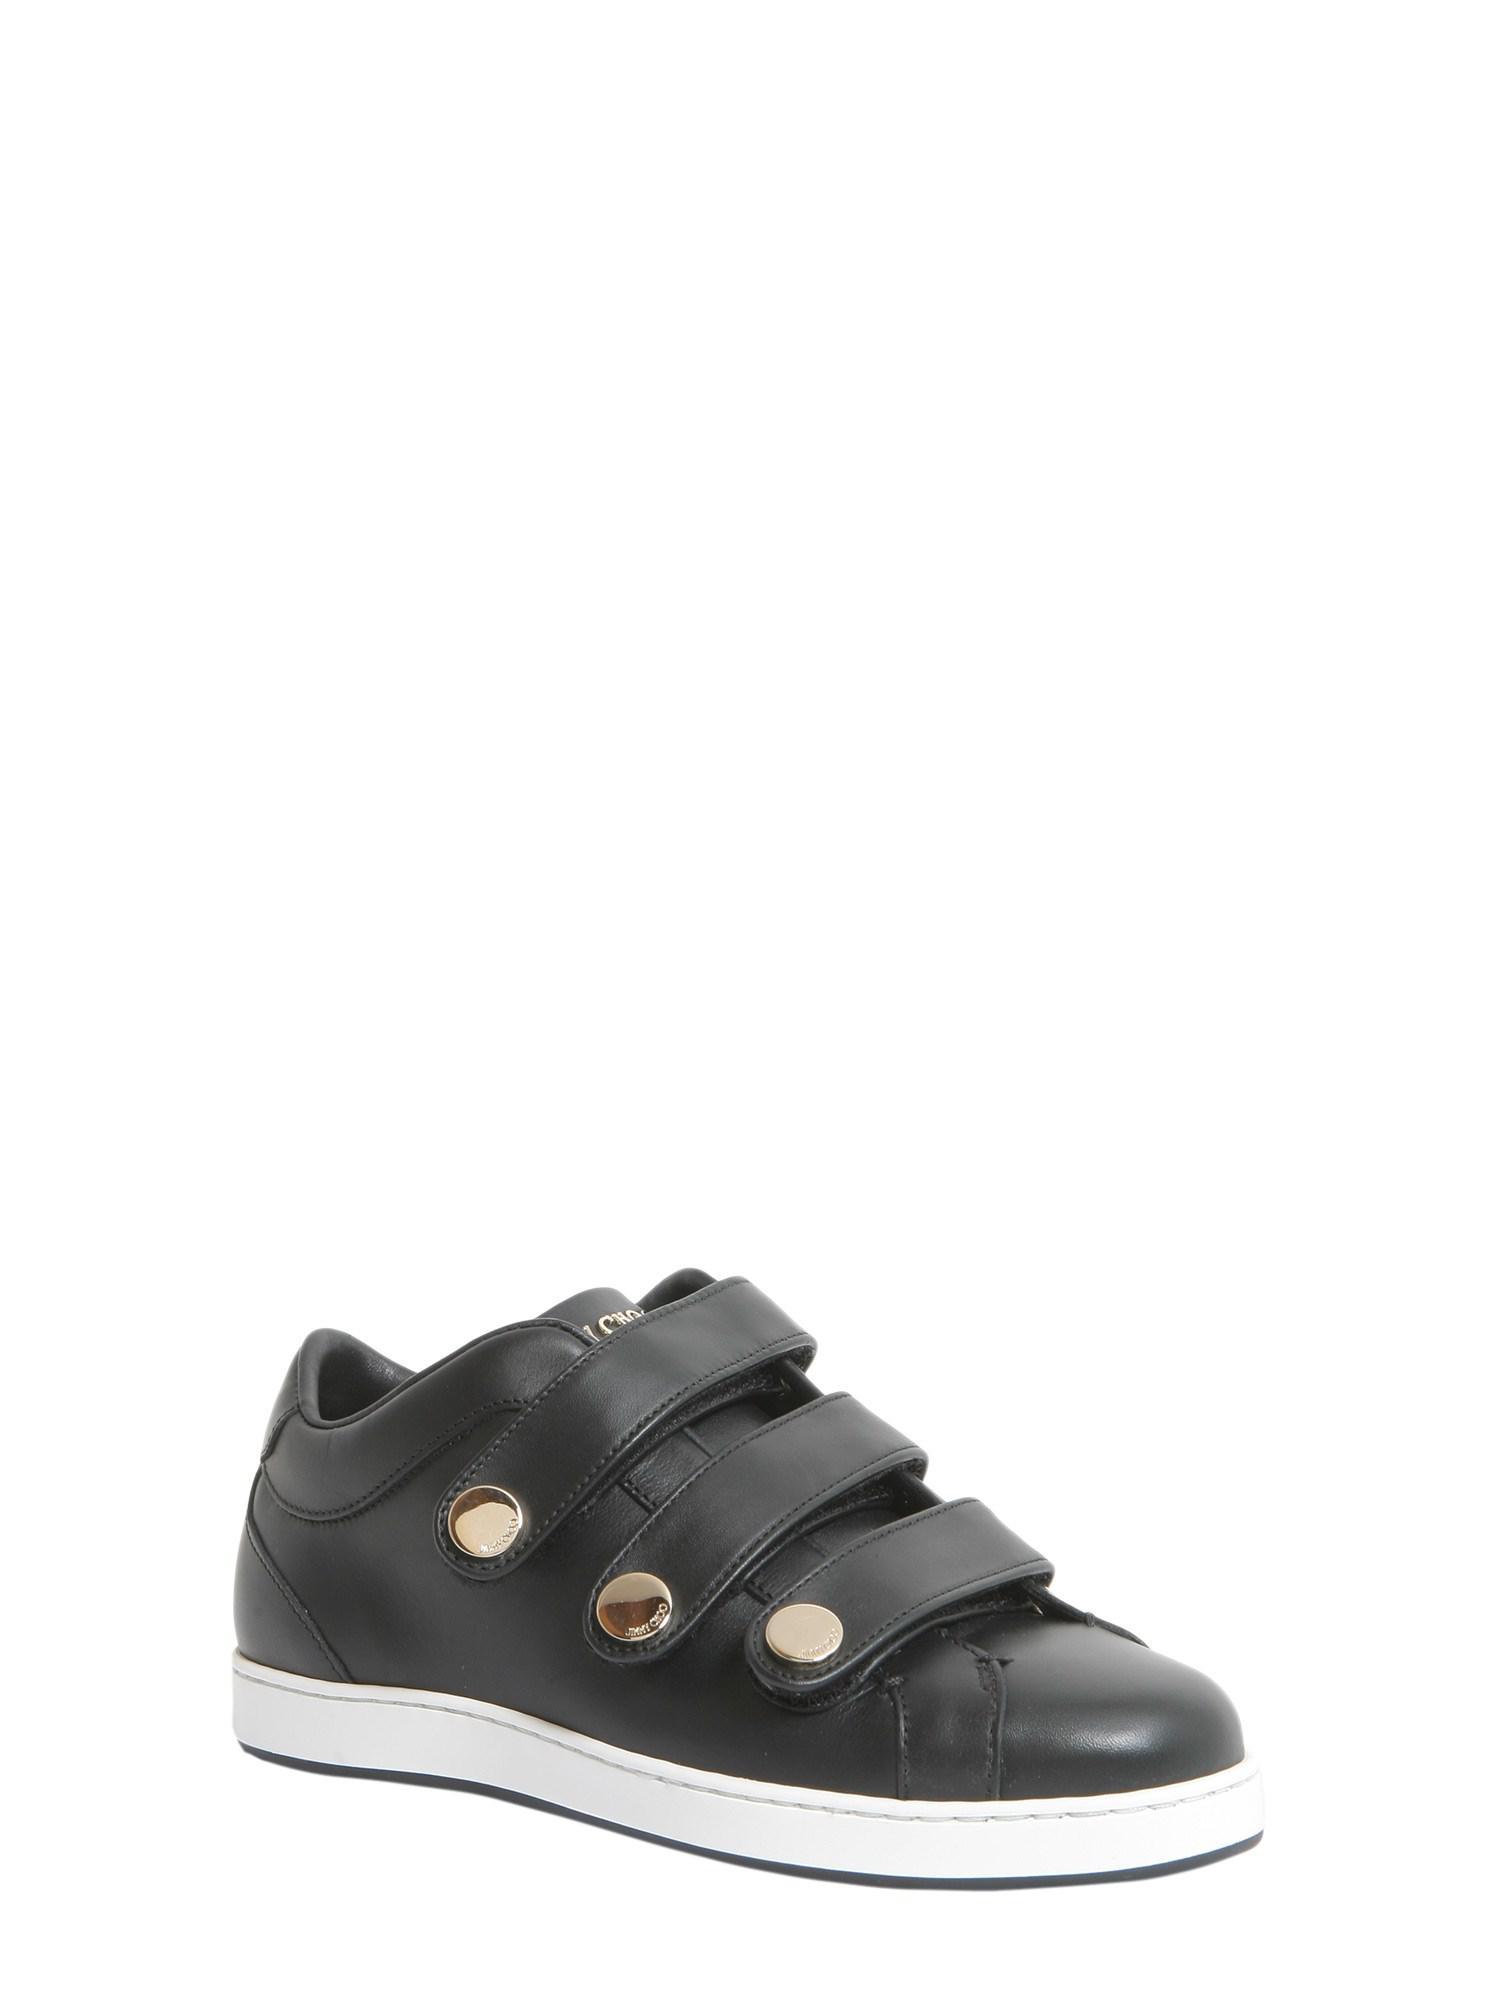 Jimmy Choo New York Leather Sneakers in Black